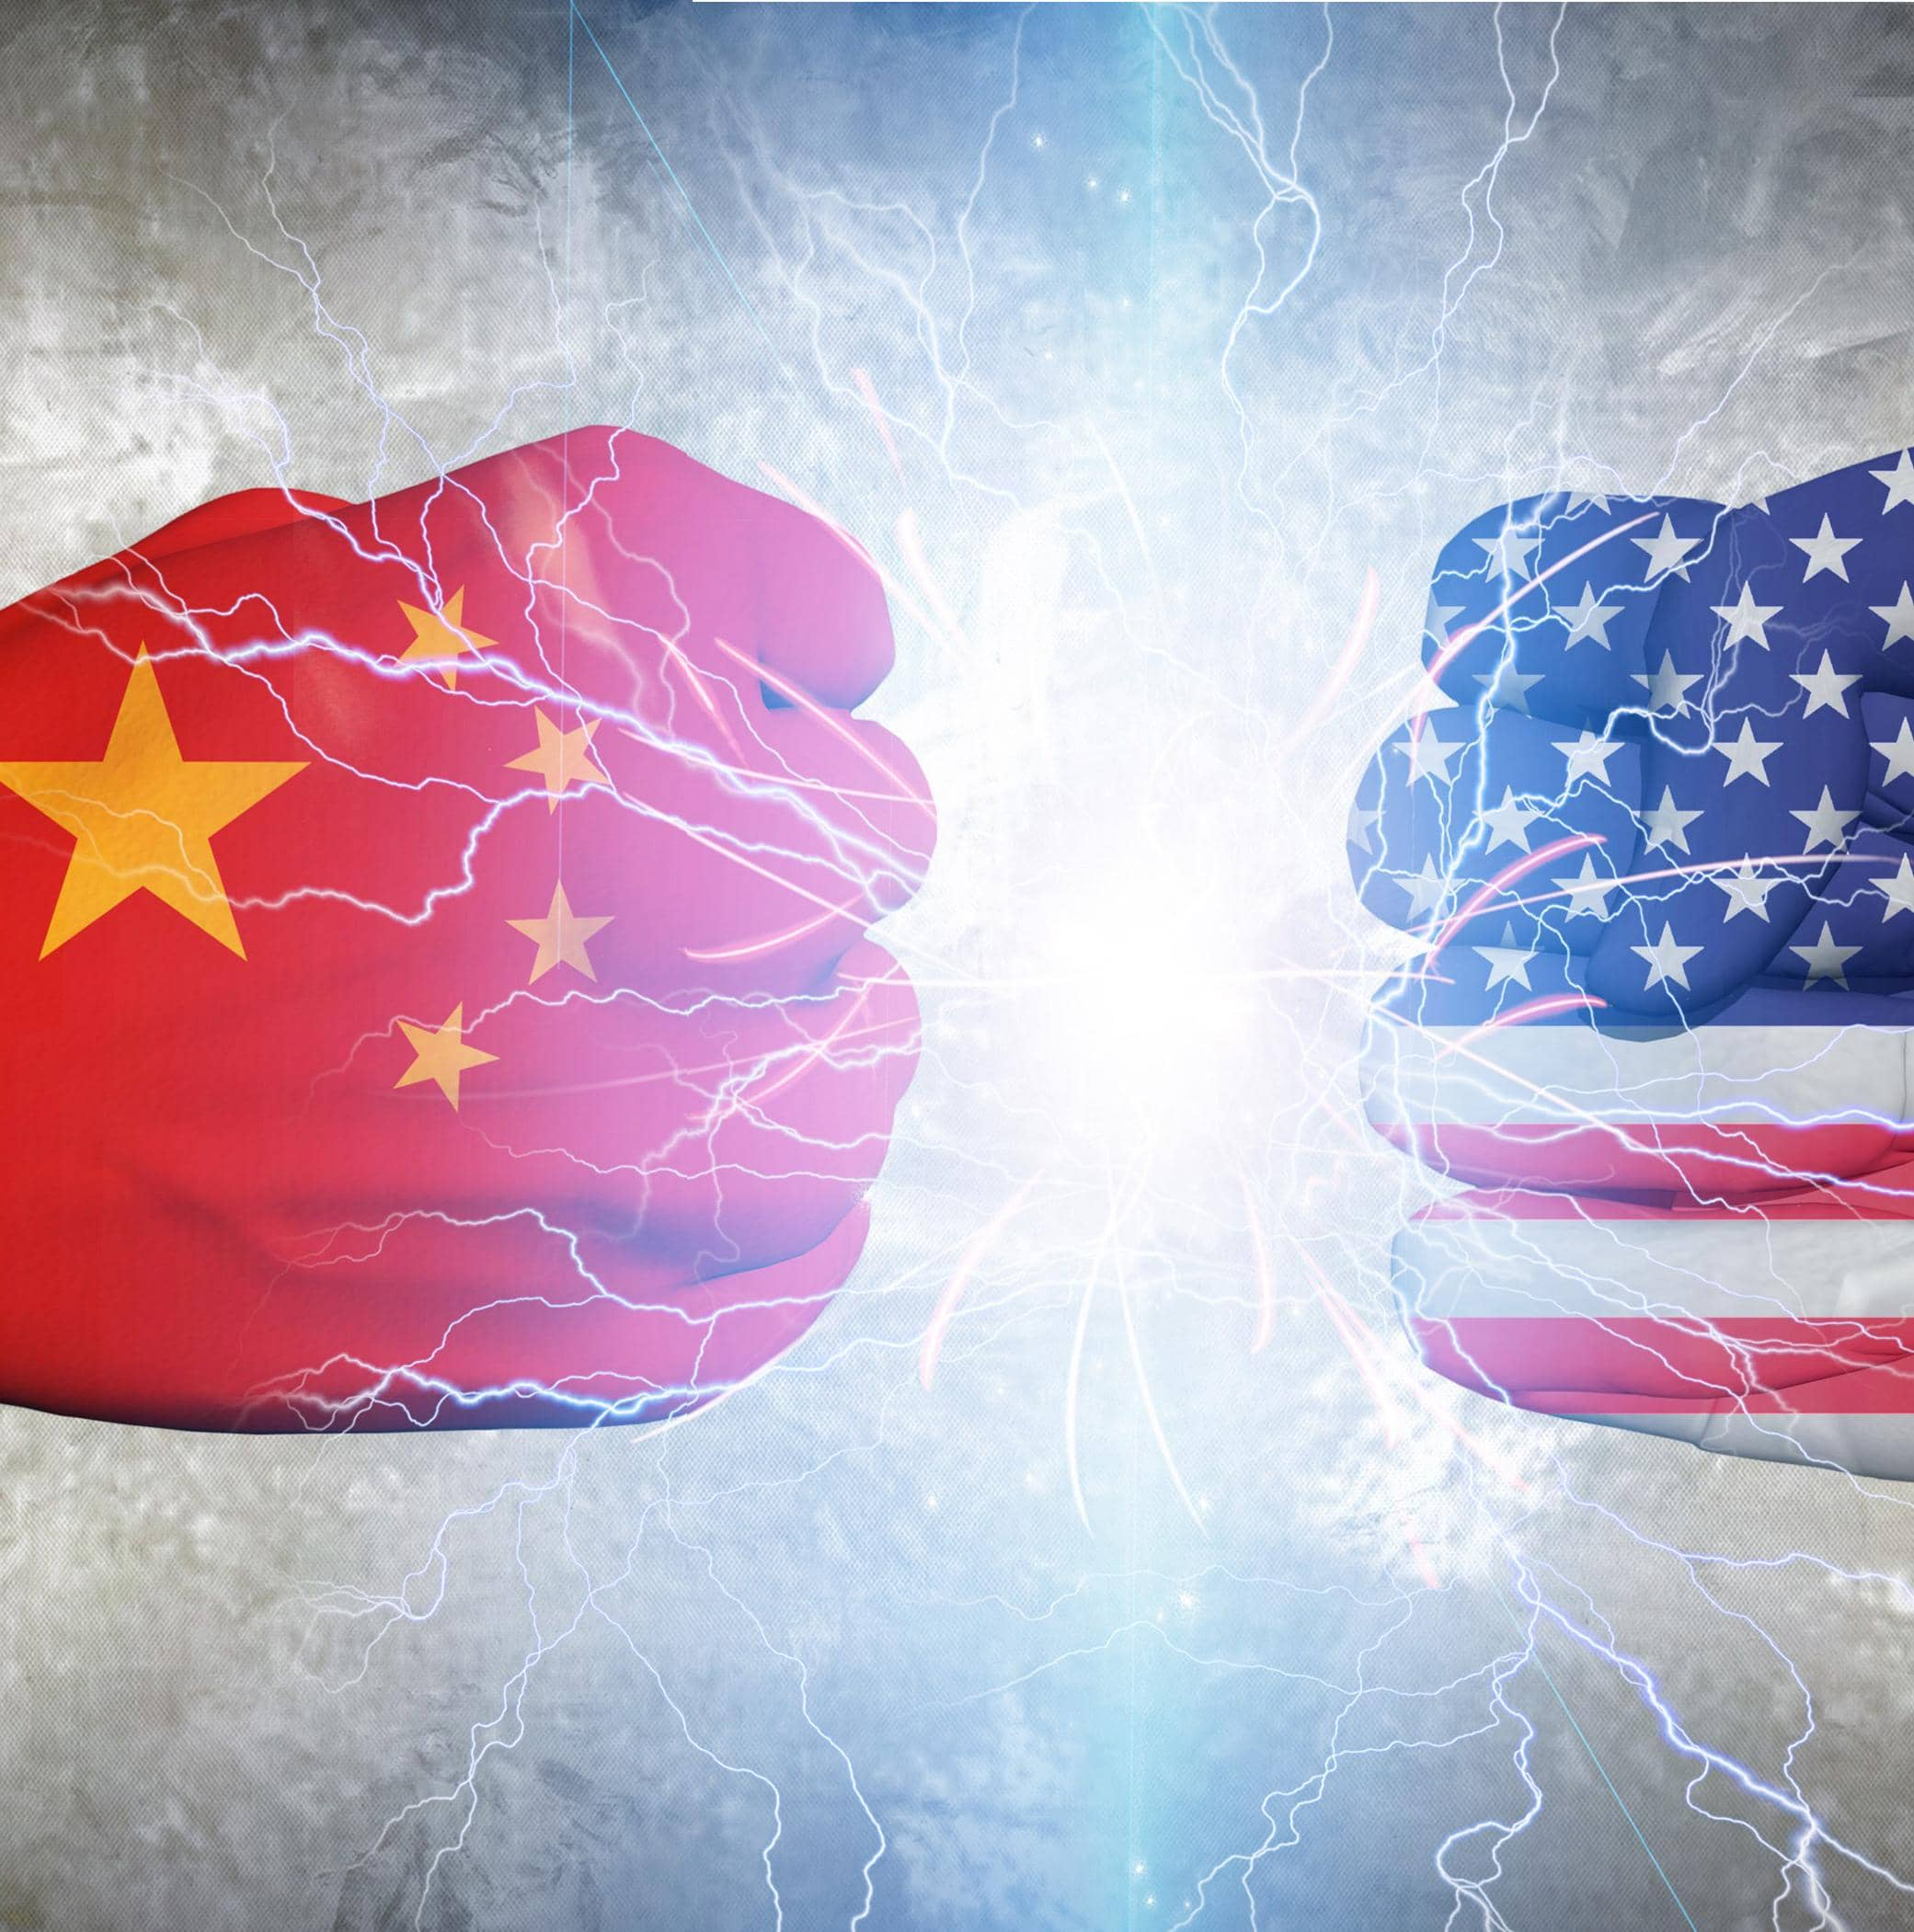 China Presses Washington for Tariff Cut in Trade Deal